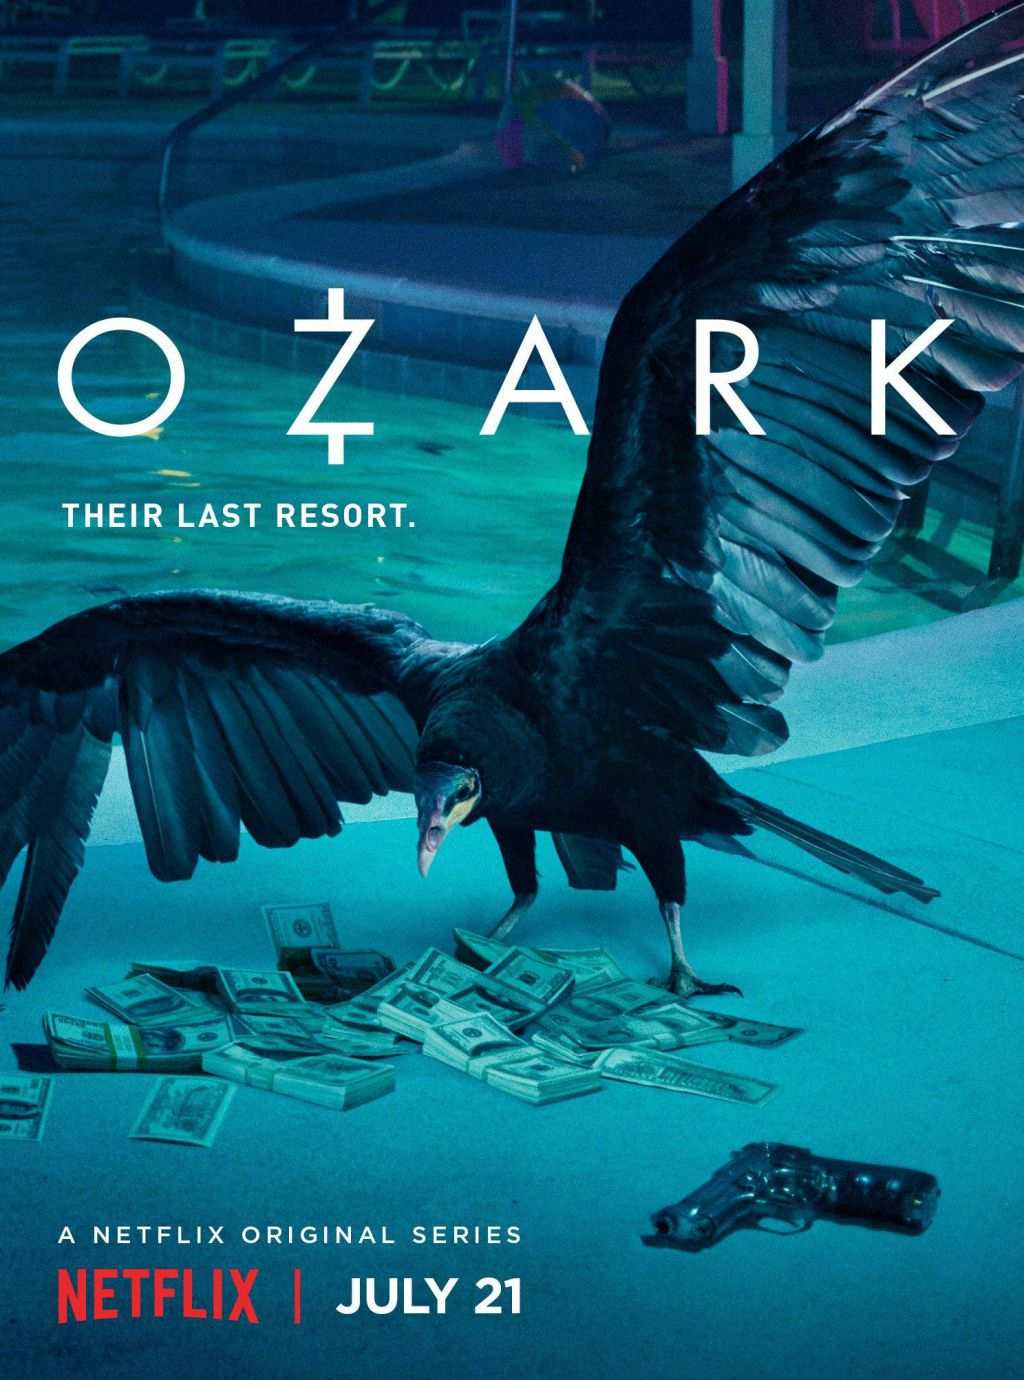 THE GROWN UP EDIT - Ozark